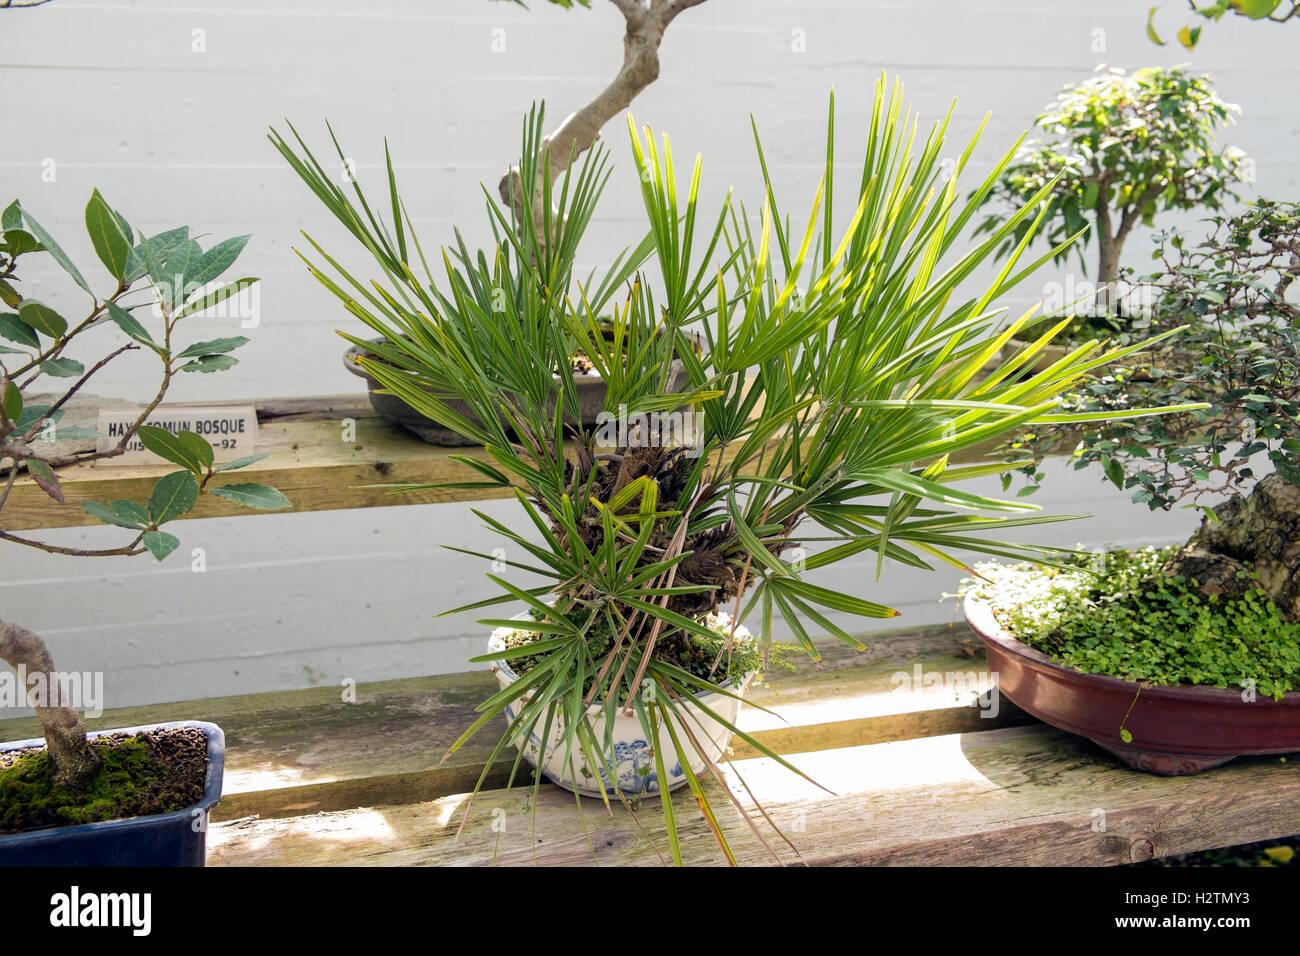 Chamaerops Humilis European Fan Palm Marbella Bonsai Museum Stock Photo Alamy